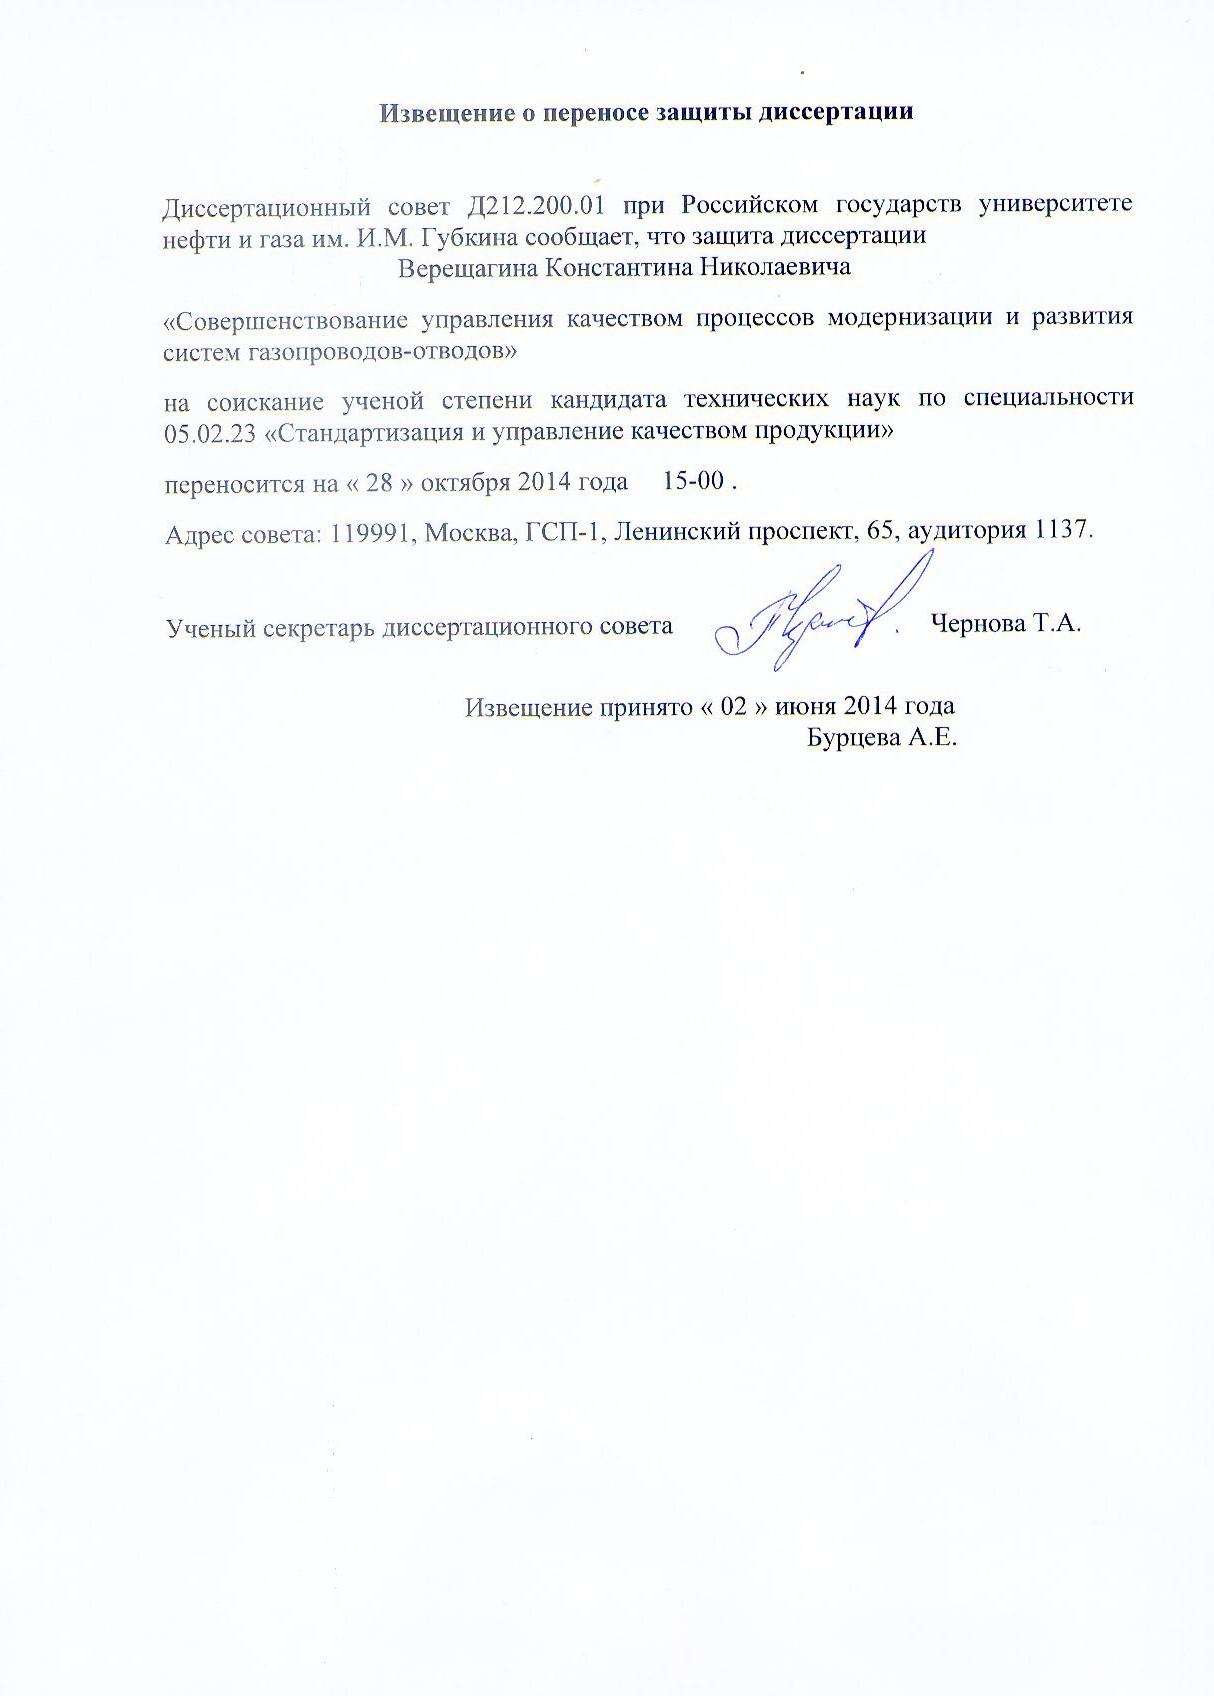 Диссертации ФГБОУ ВО РГУ нефти и газа НИУ имени И М Губкина  Дата